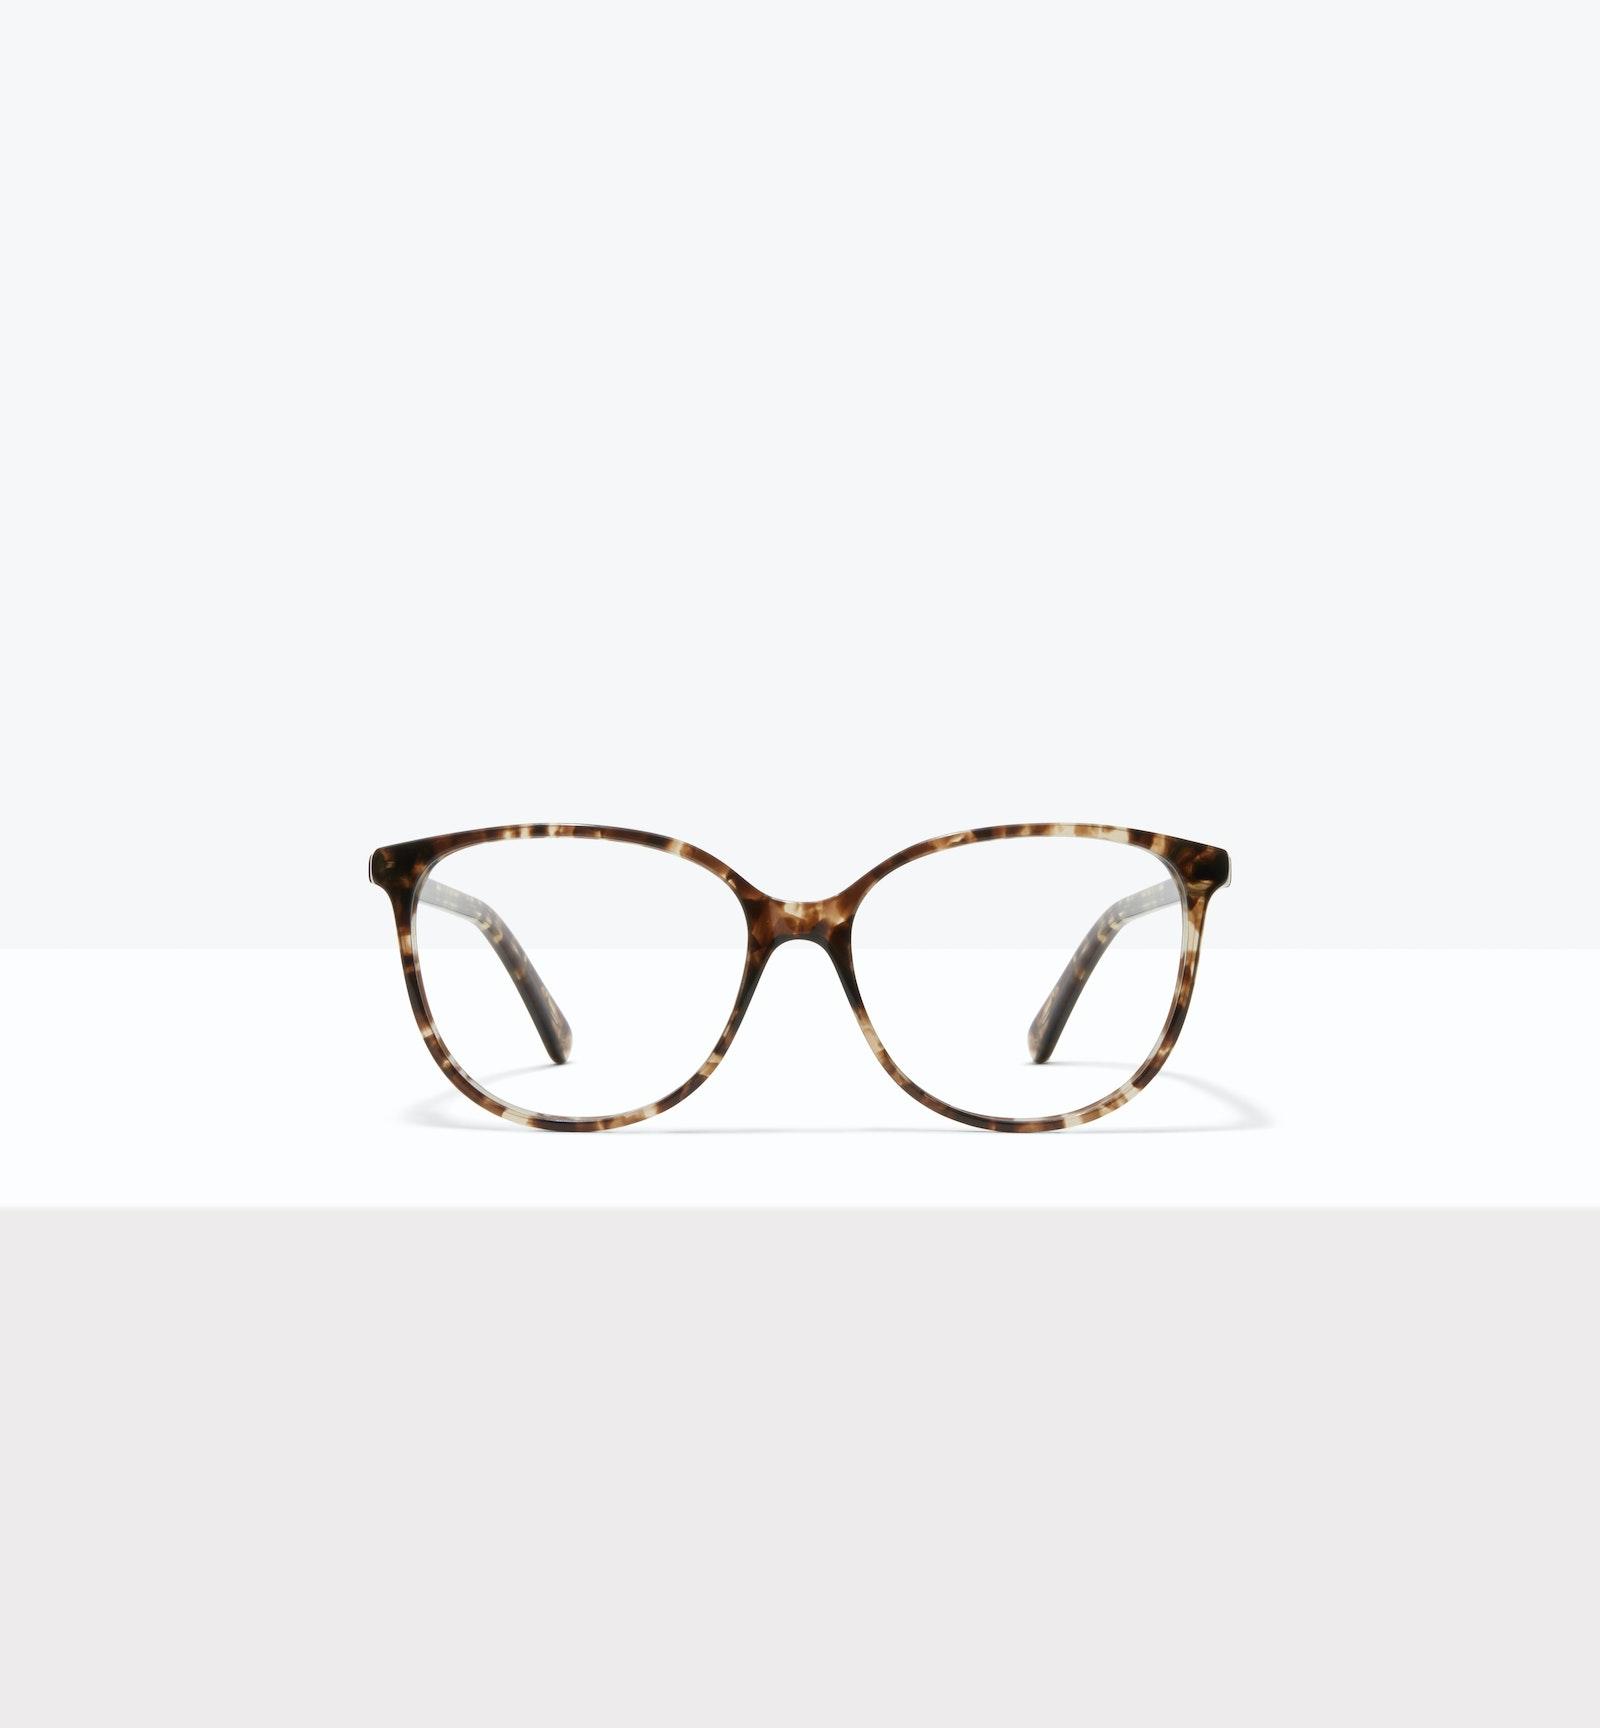 Affordable Fashion Glasses Cat Eye Eyeglasses Women Imagine XL Leopard